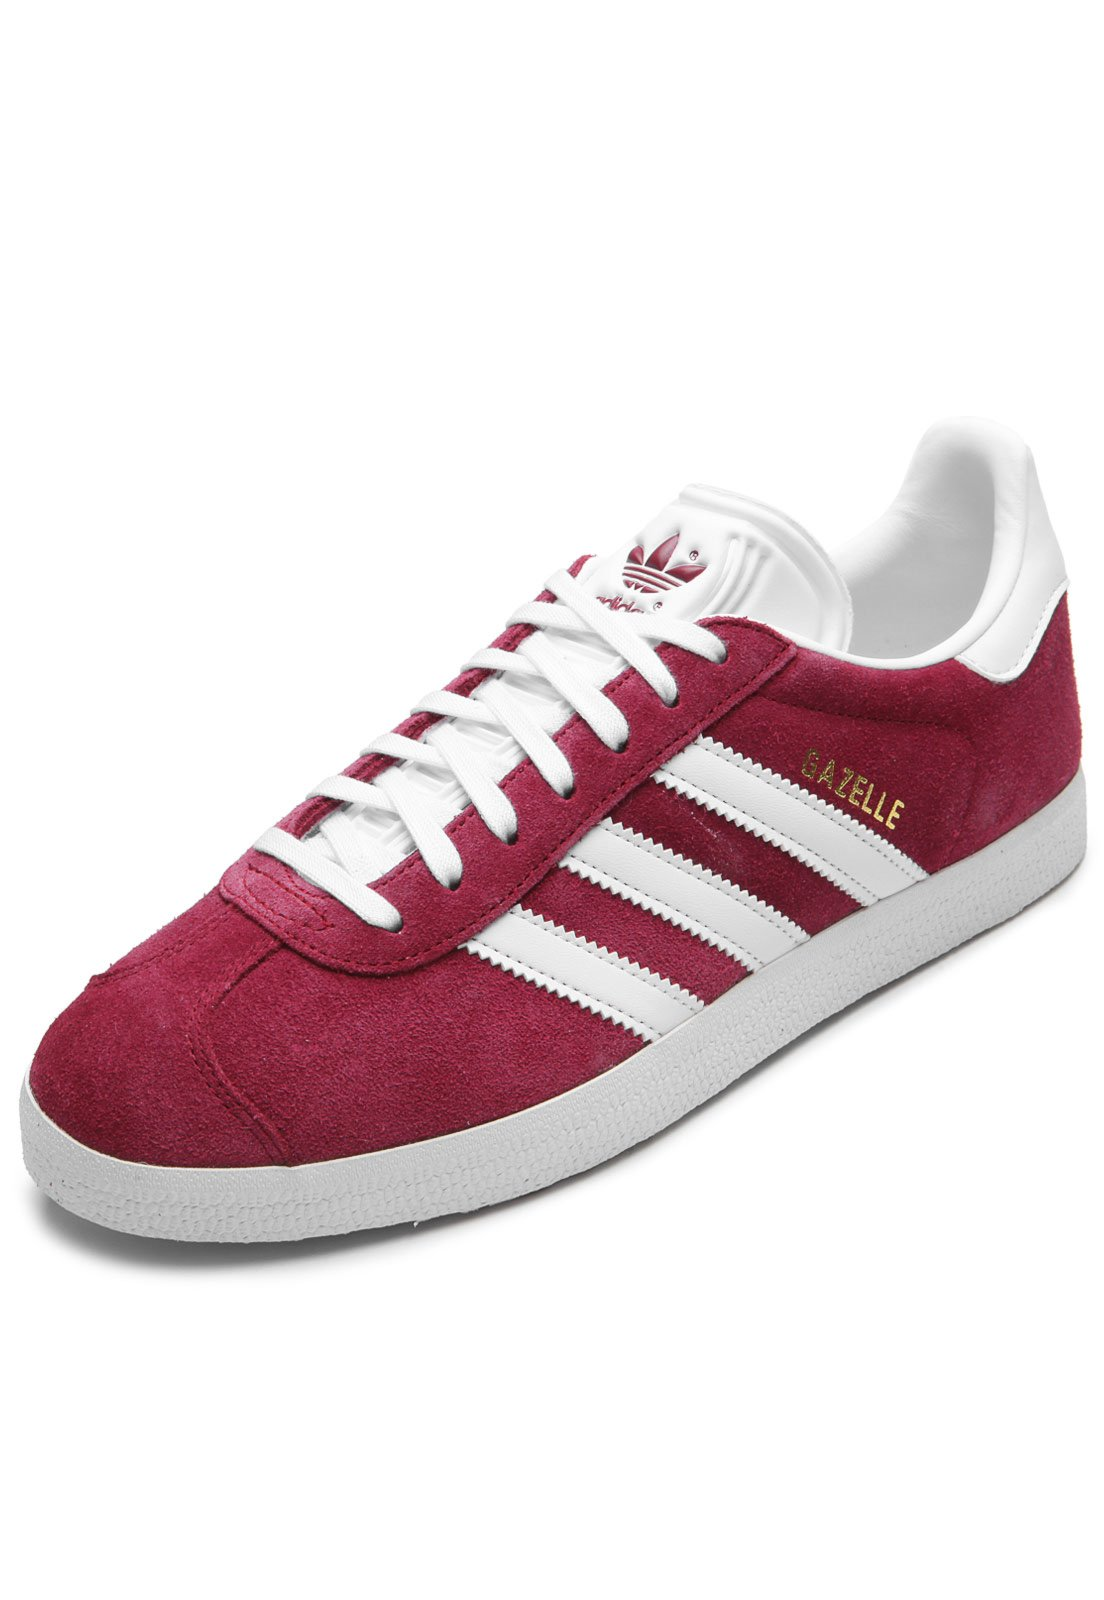 adidas NastyQuick Chaussures de Football mi Hautes pour